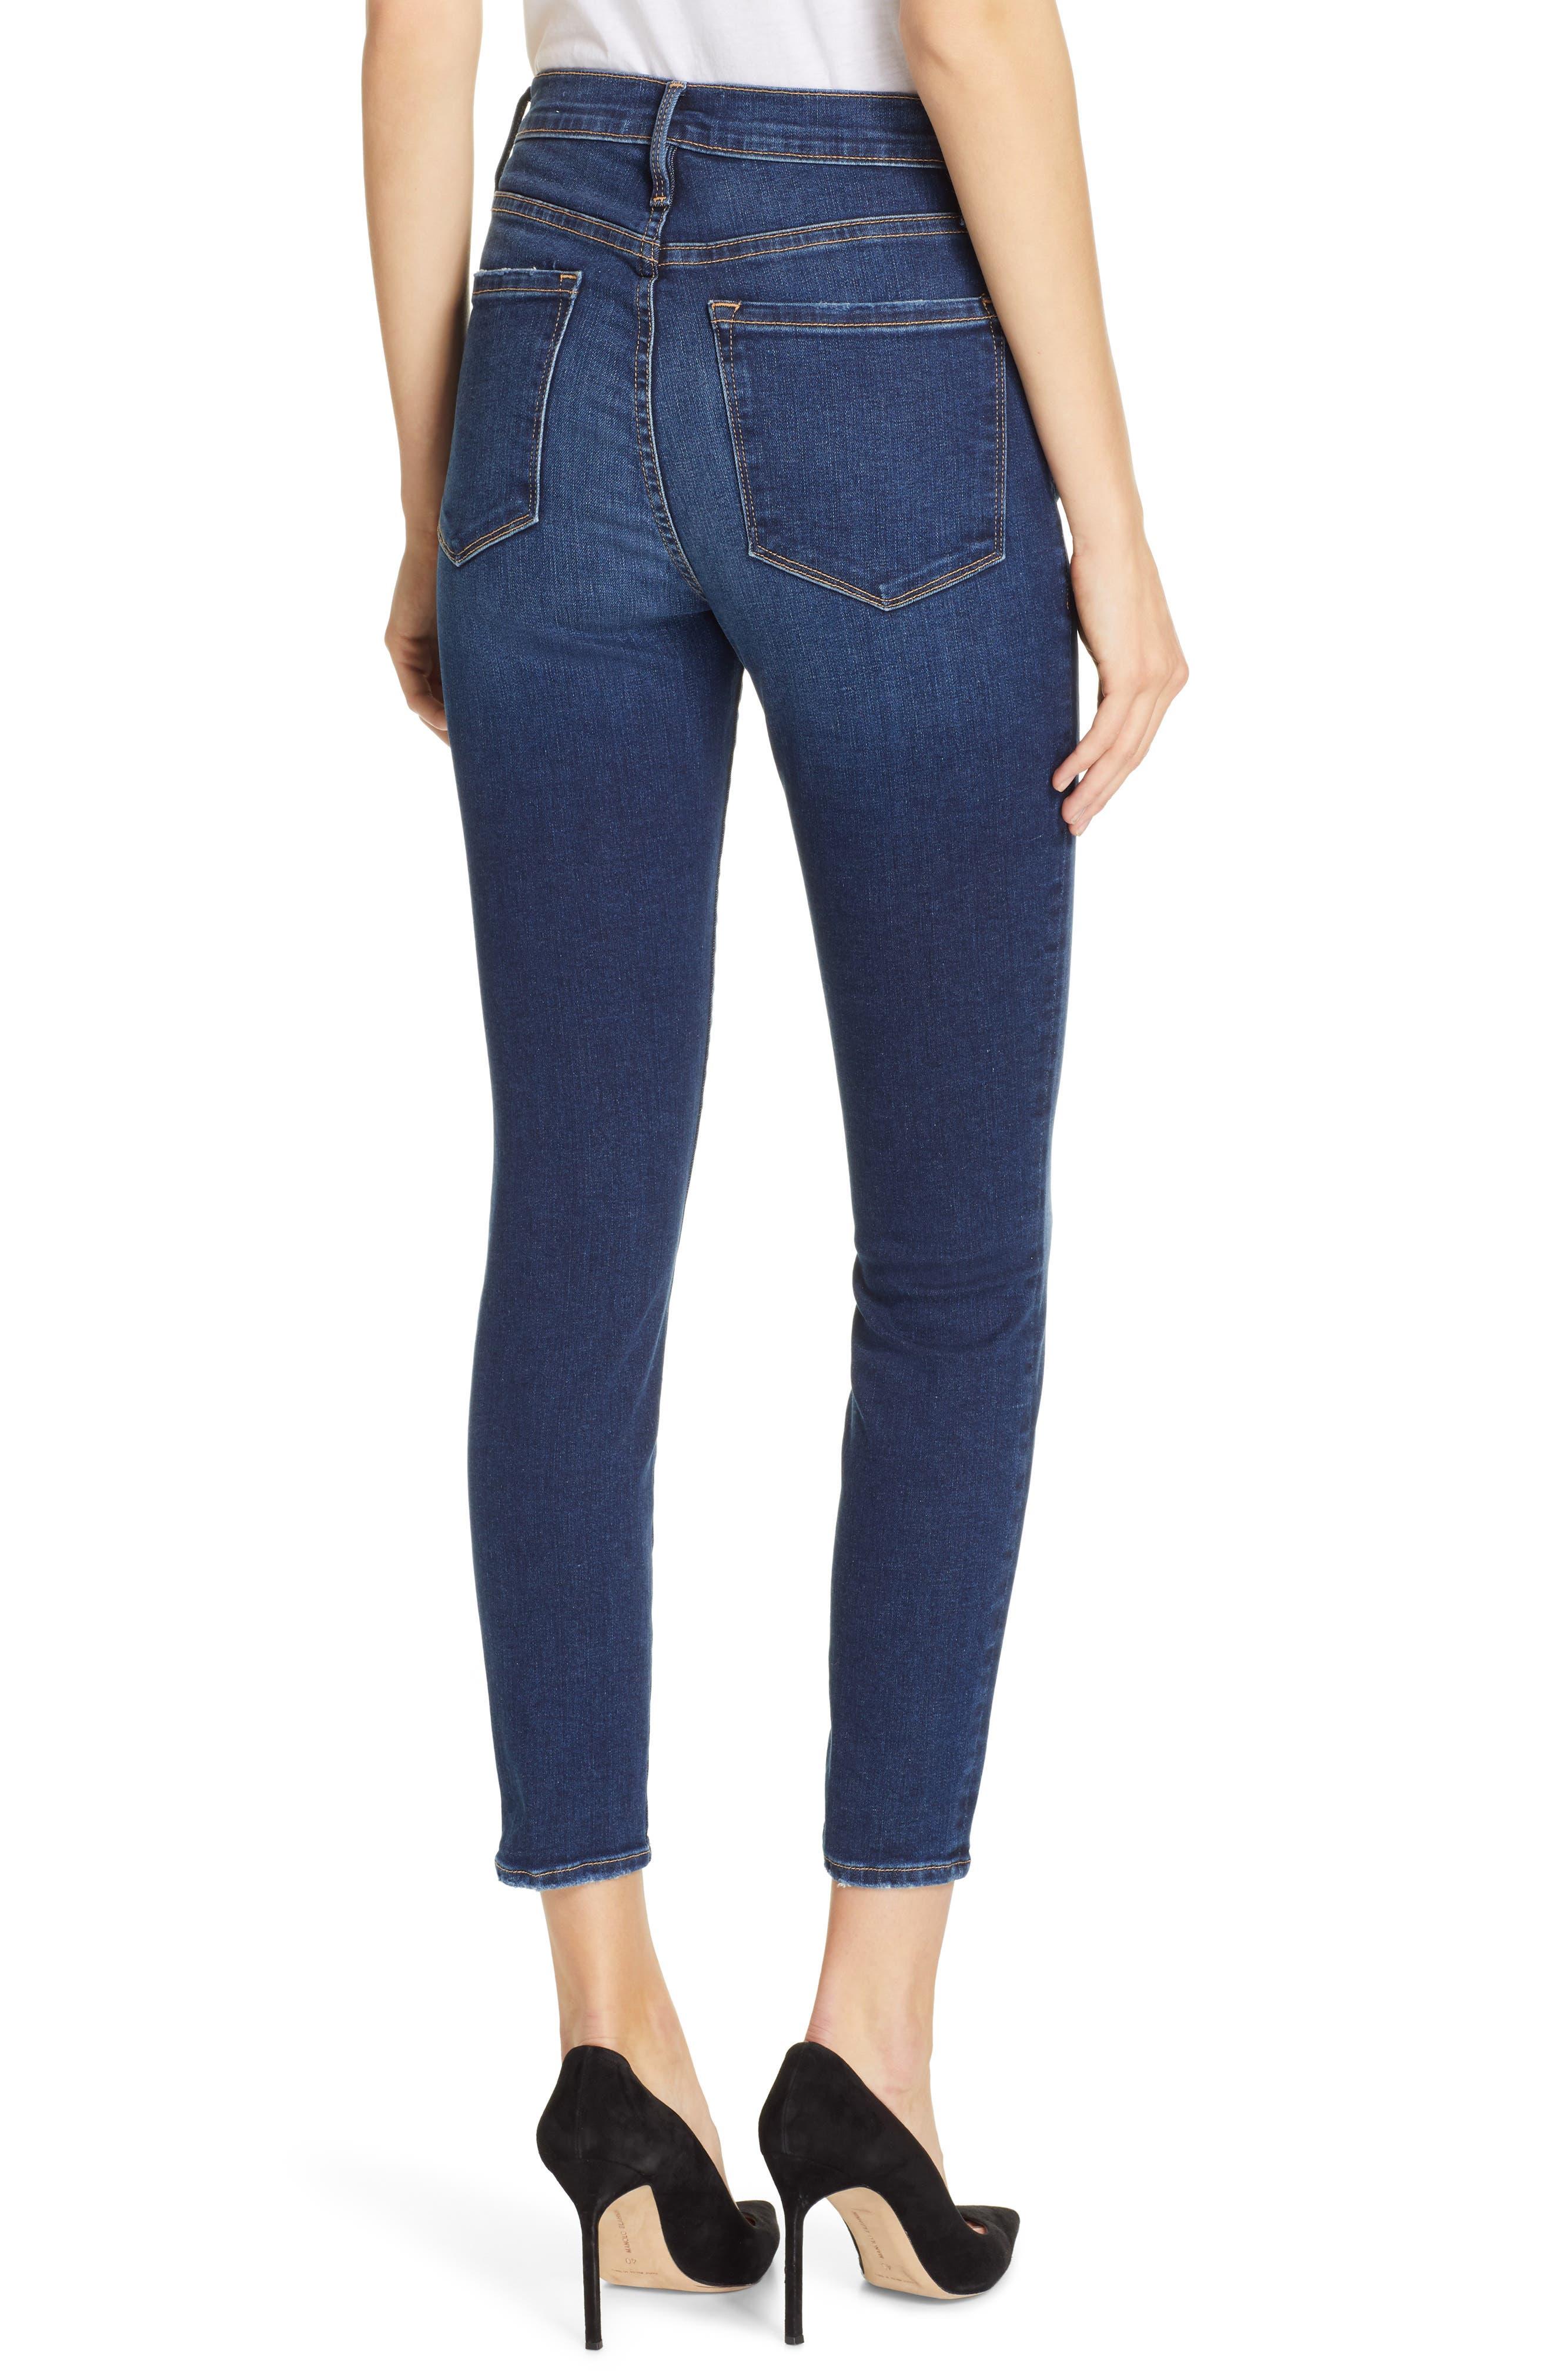 FRAME, Ali High Waist Crop Cigarette Skinny Jeans, Alternate thumbnail 2, color, MANO